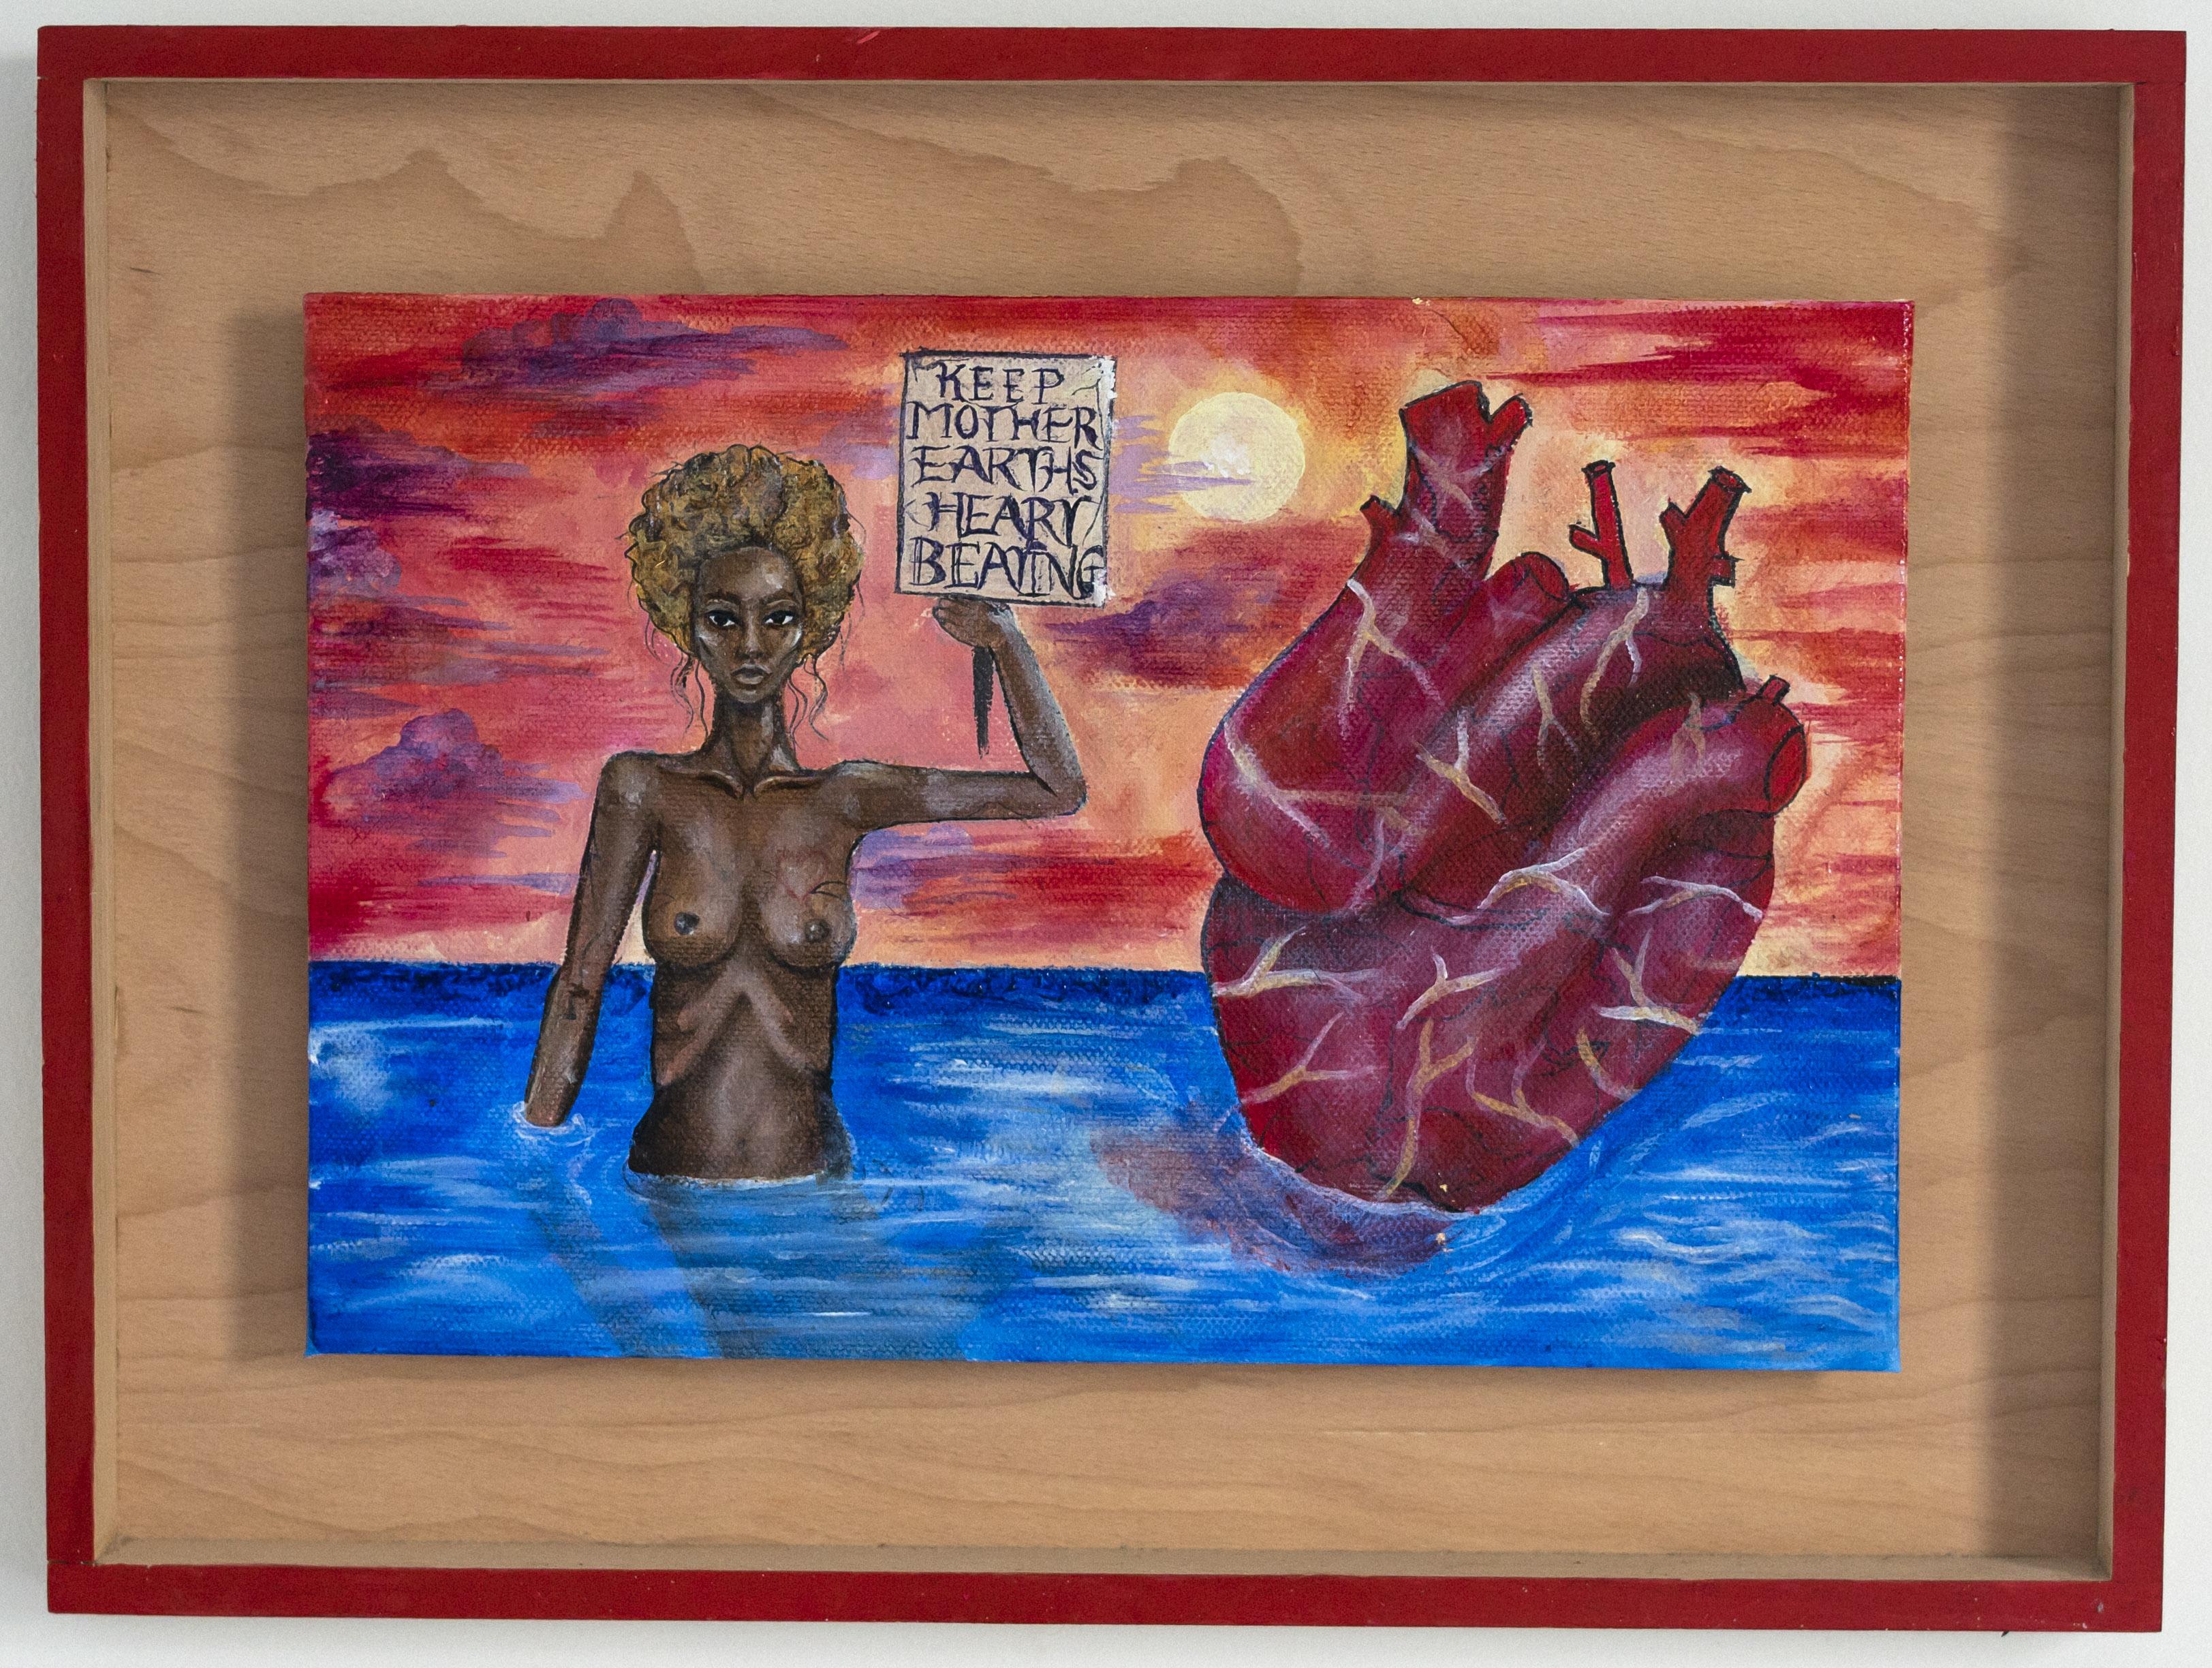 'Keep mother earths heart beating'